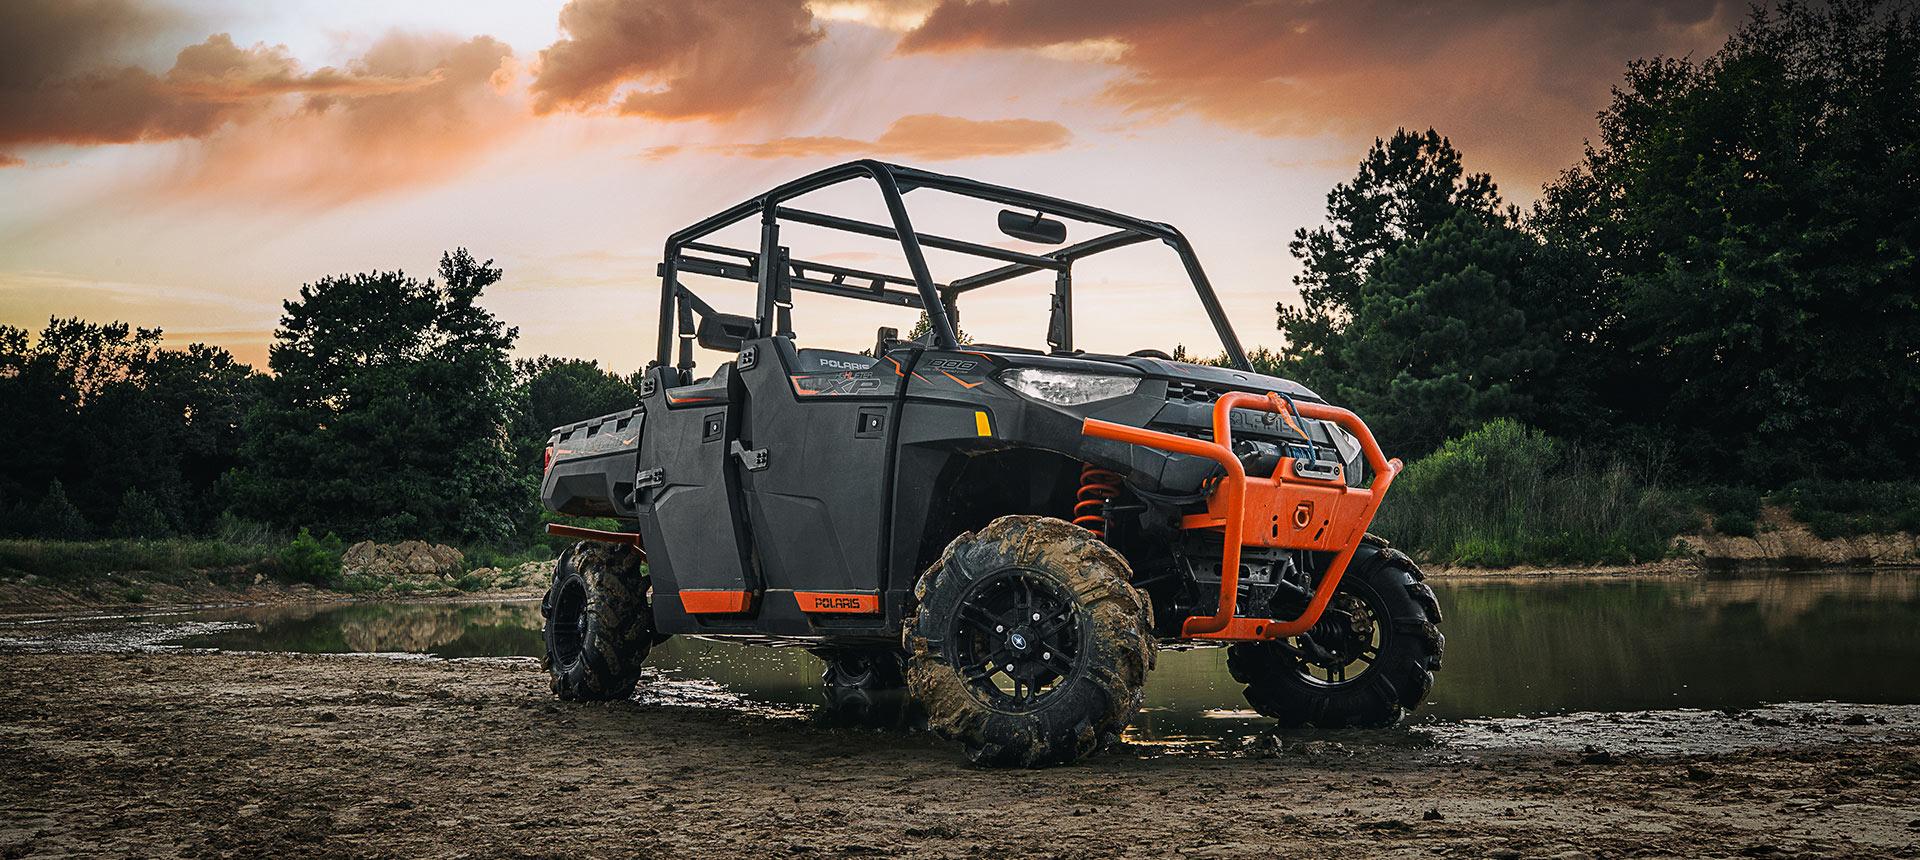 ranger-crew-xp-100-highlifter-media-5